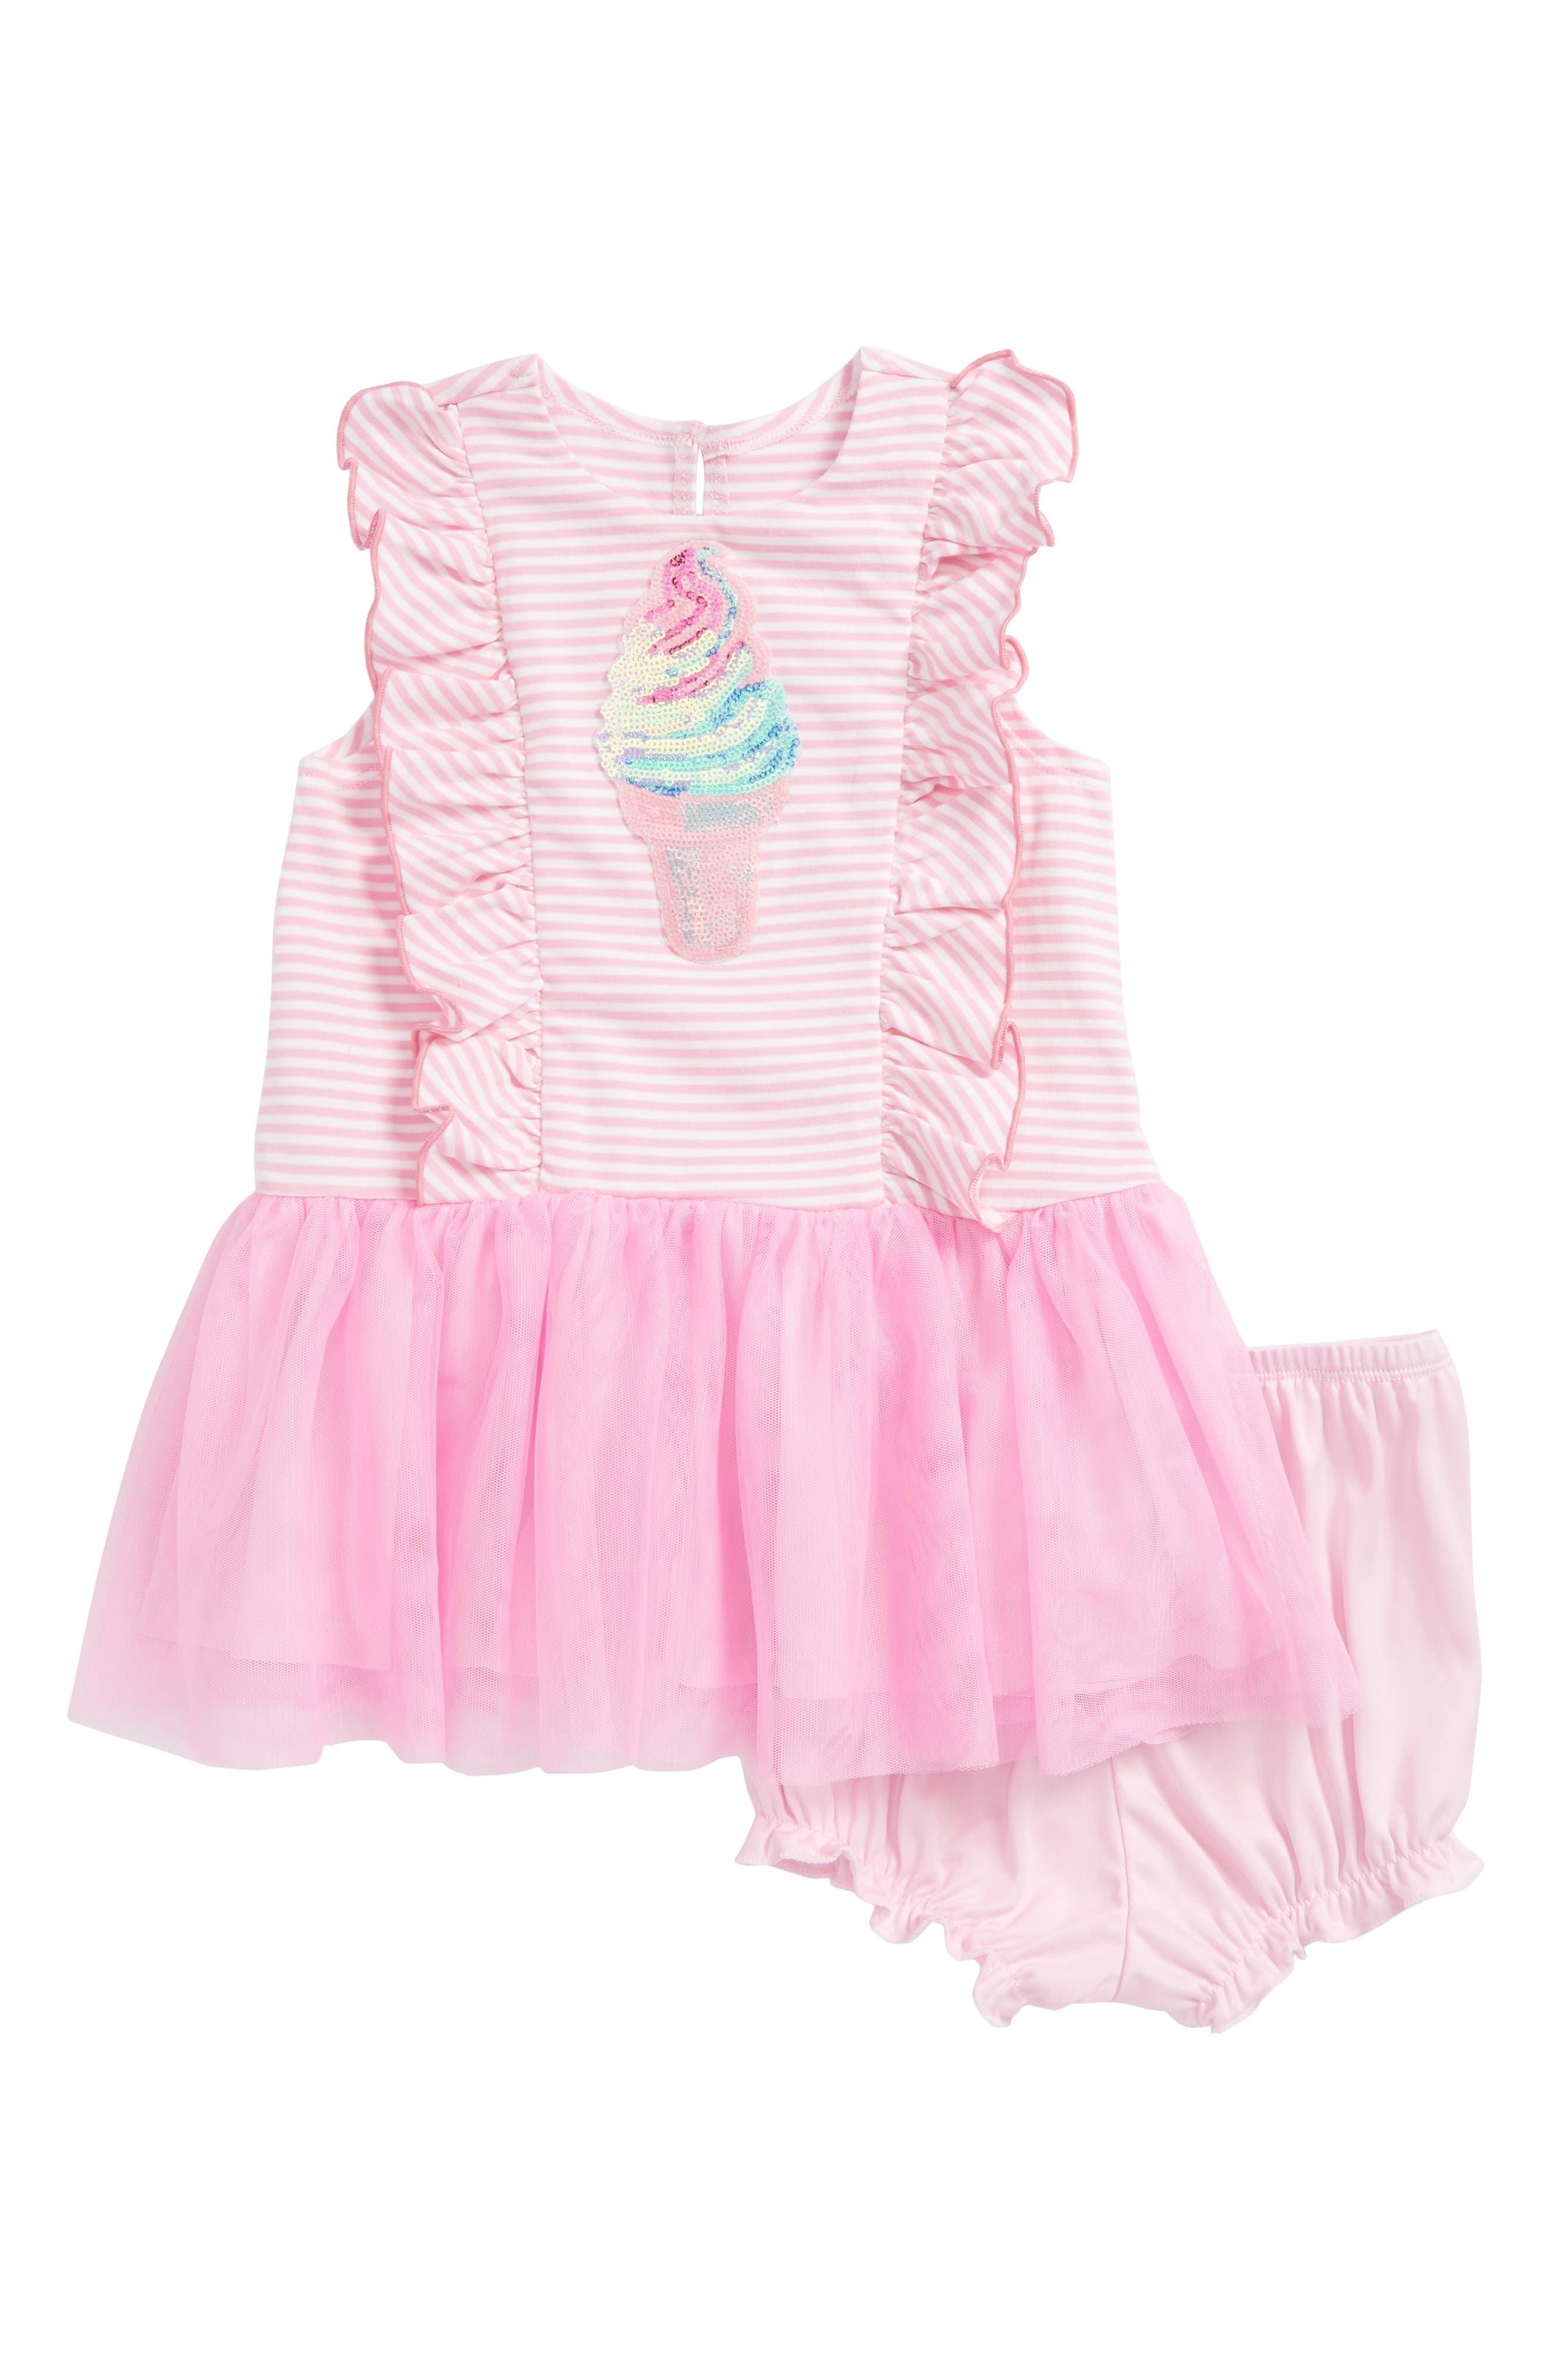 Pippa & Julie Ice Cream Cone Tutu Dress (Baby Girls)